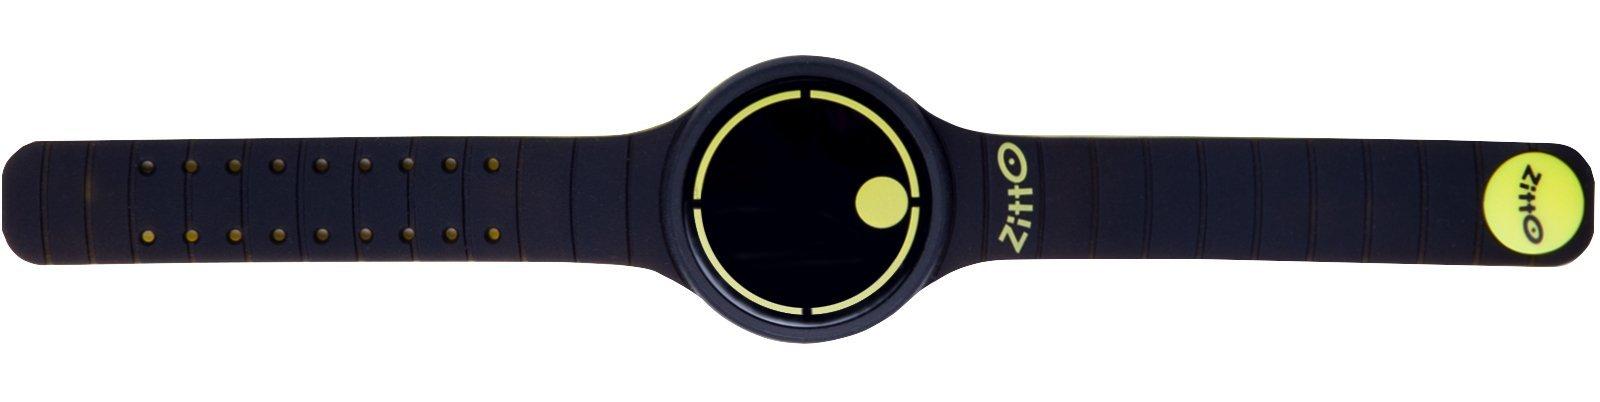 Zitto-Armbanduhr-Move-Modell-Oxide-Black